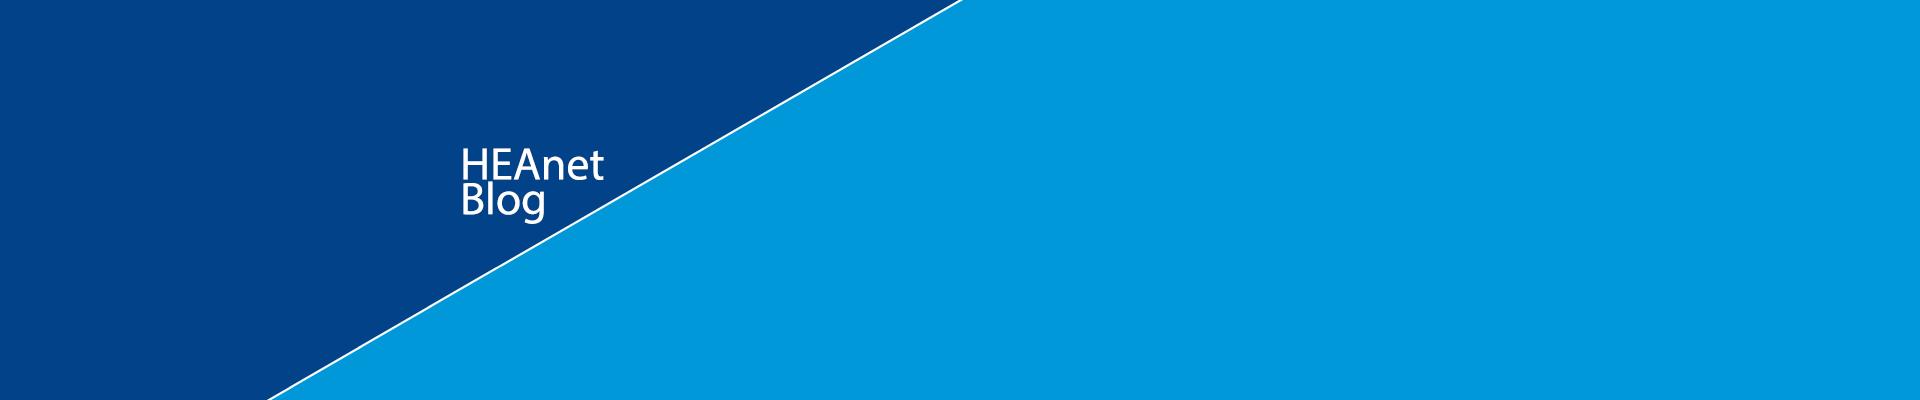 heanet_blog_banner